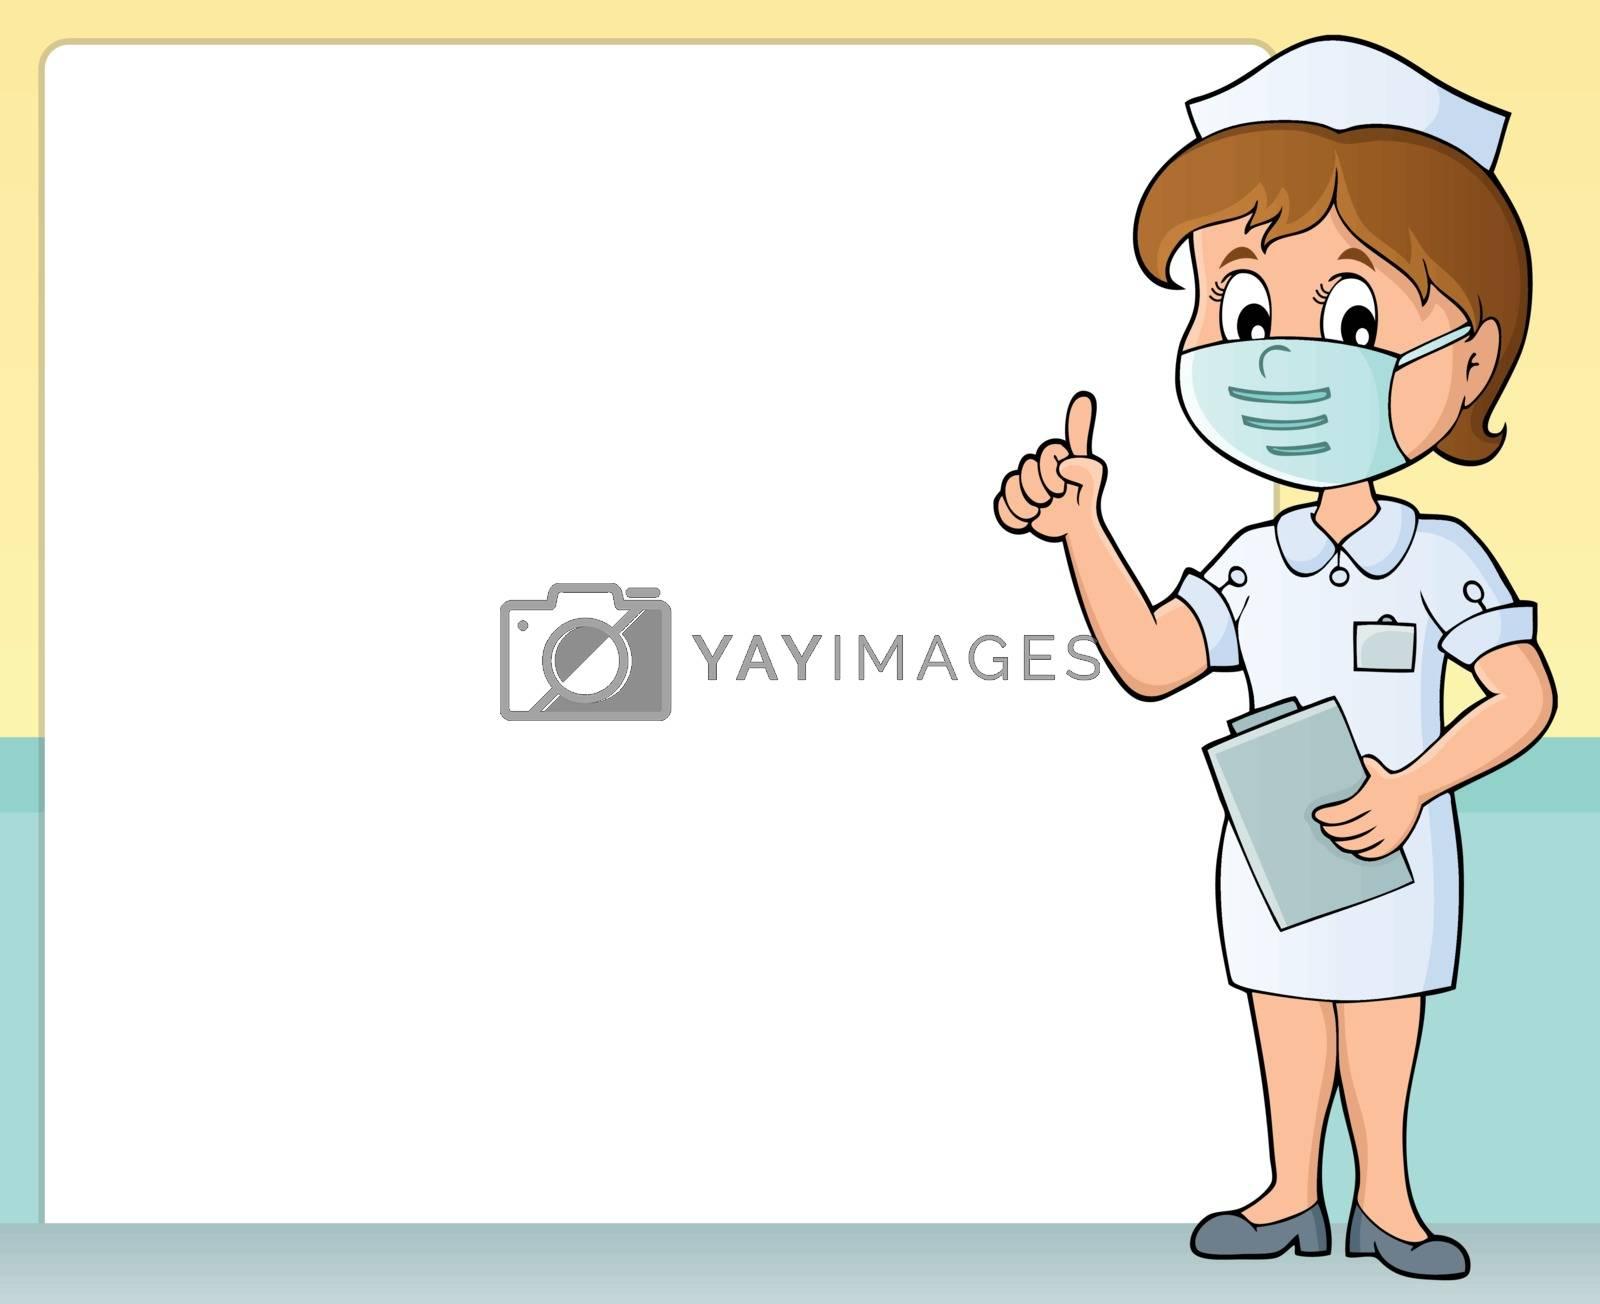 Nurse theme frame 1 - eps10 vector illustration.